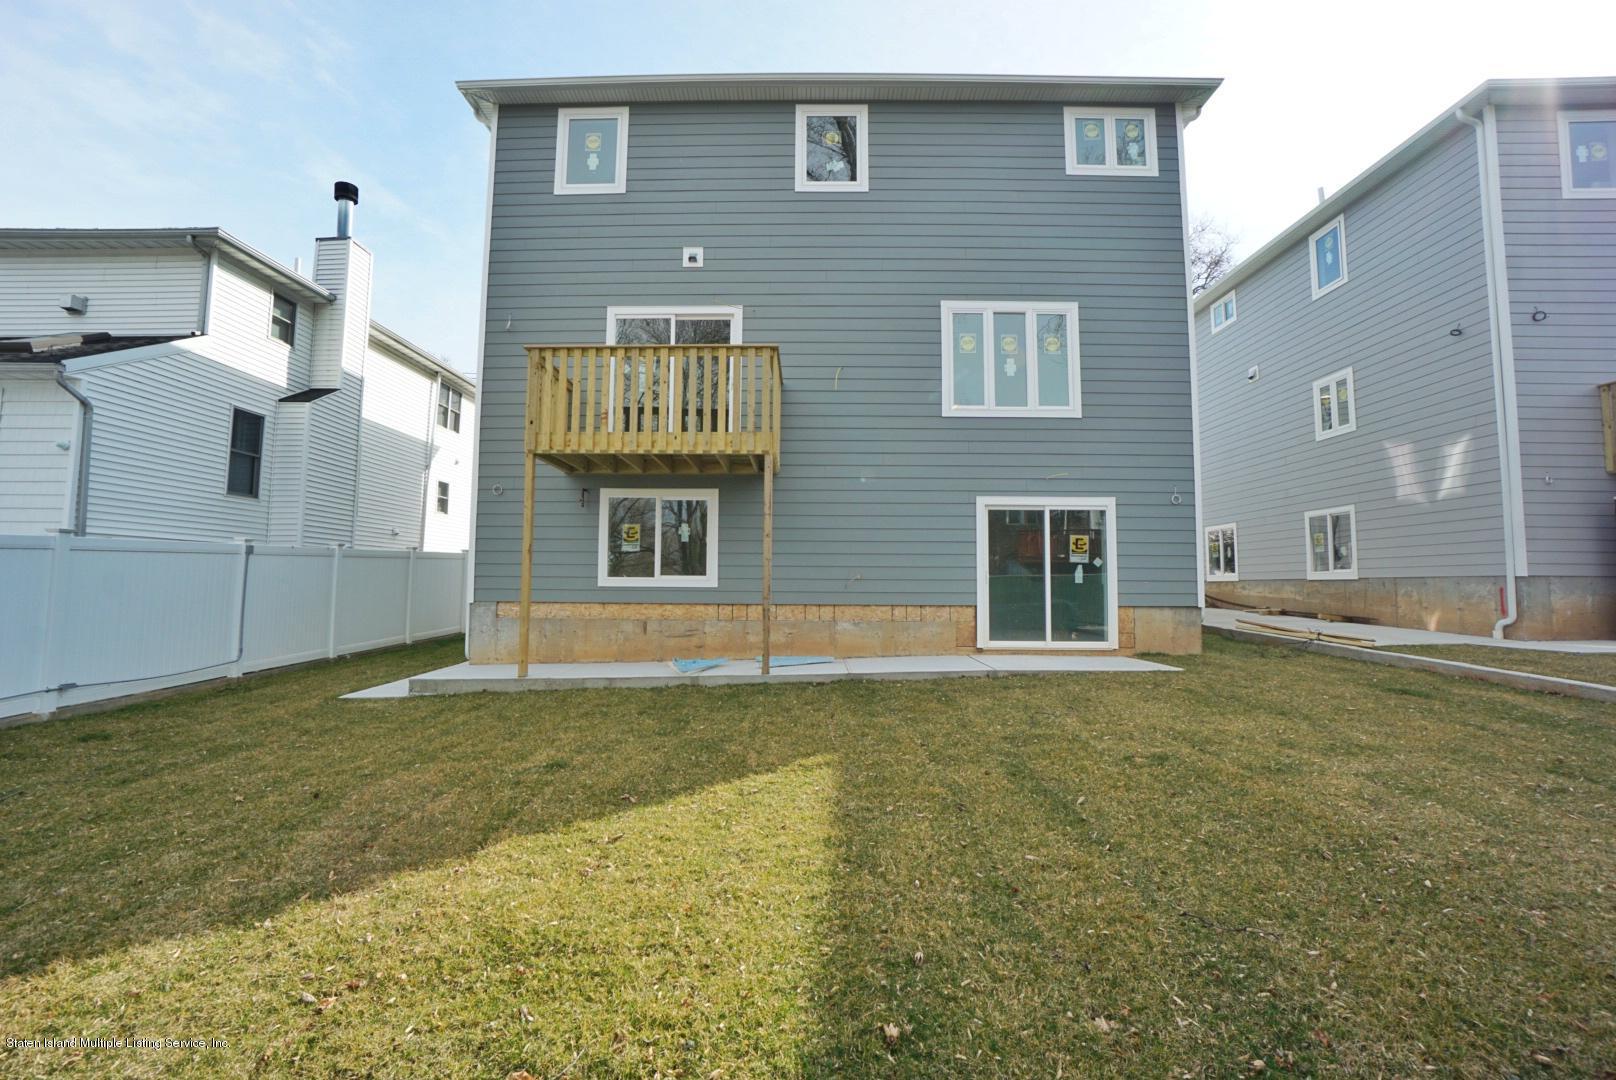 Single Family - Detached 170 Fairview Avenue  Staten Island, NY 10314, MLS-1126684-14